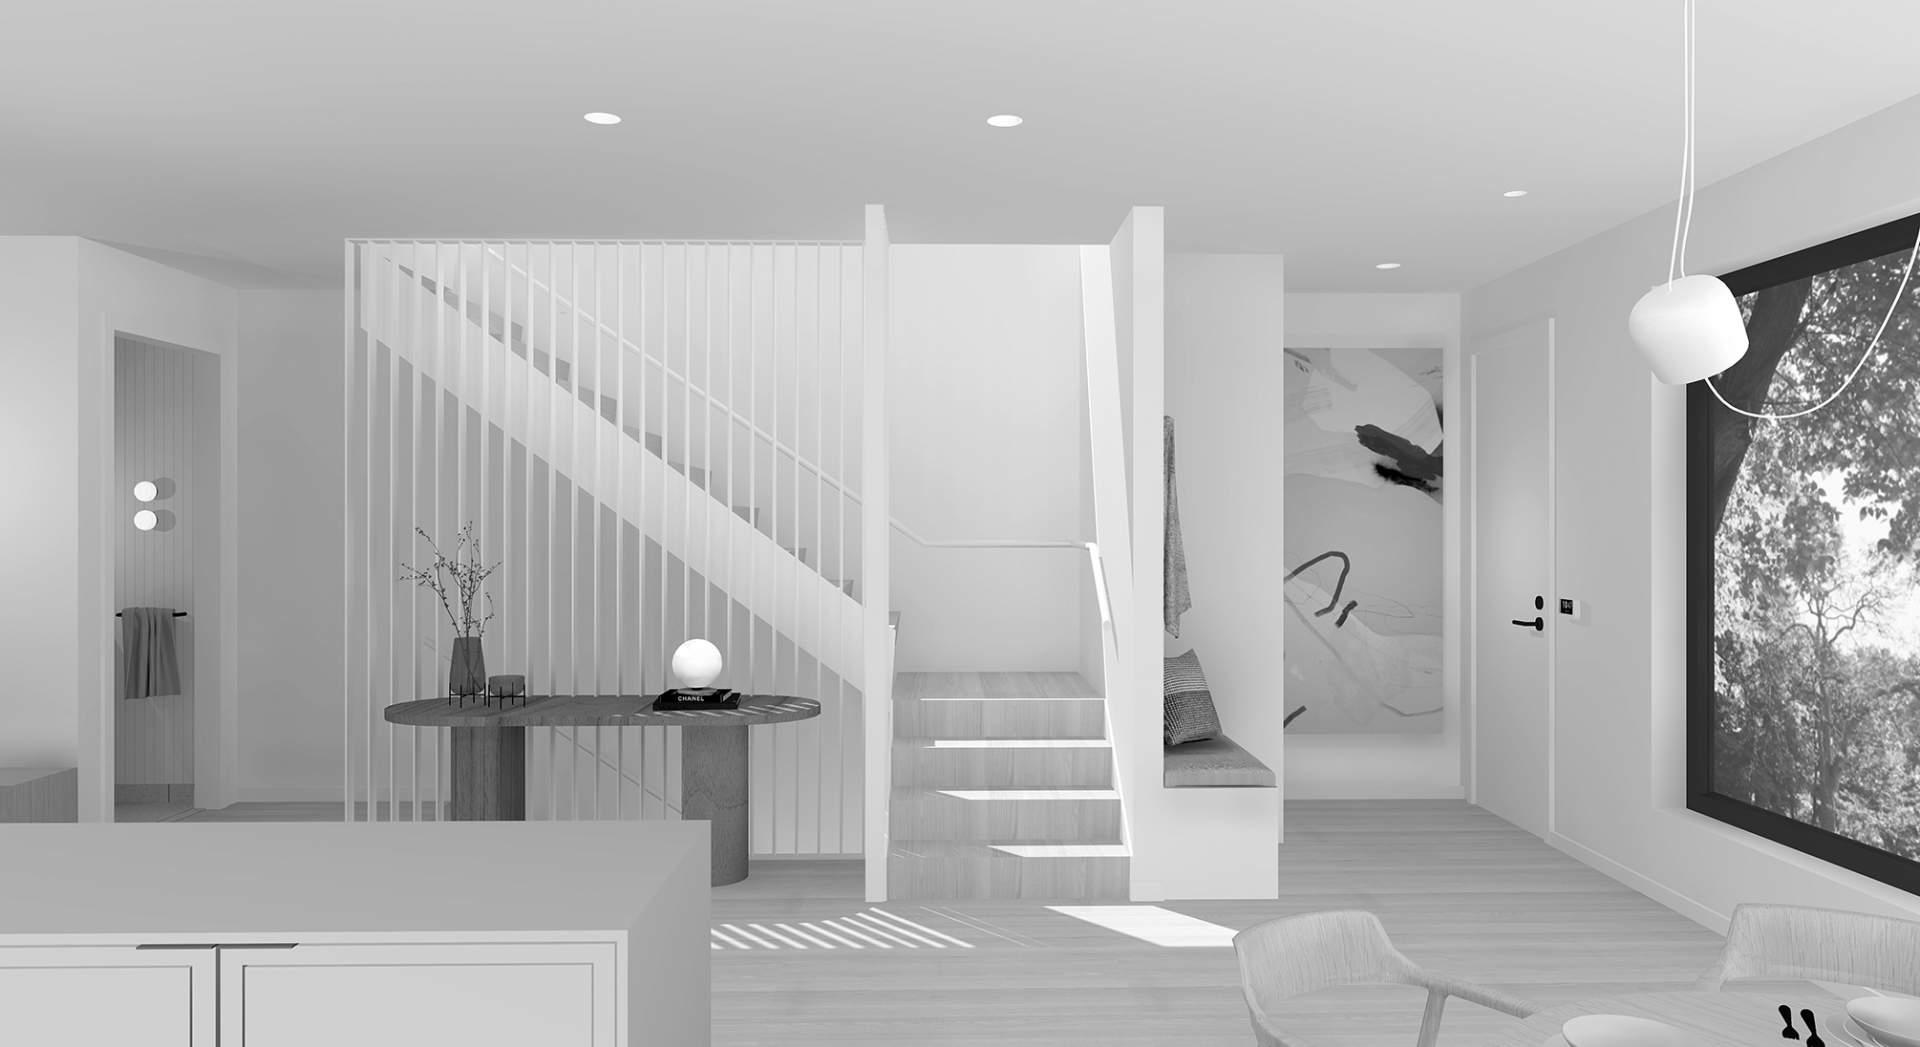 Block 910 - Black & White Photo Of Interior